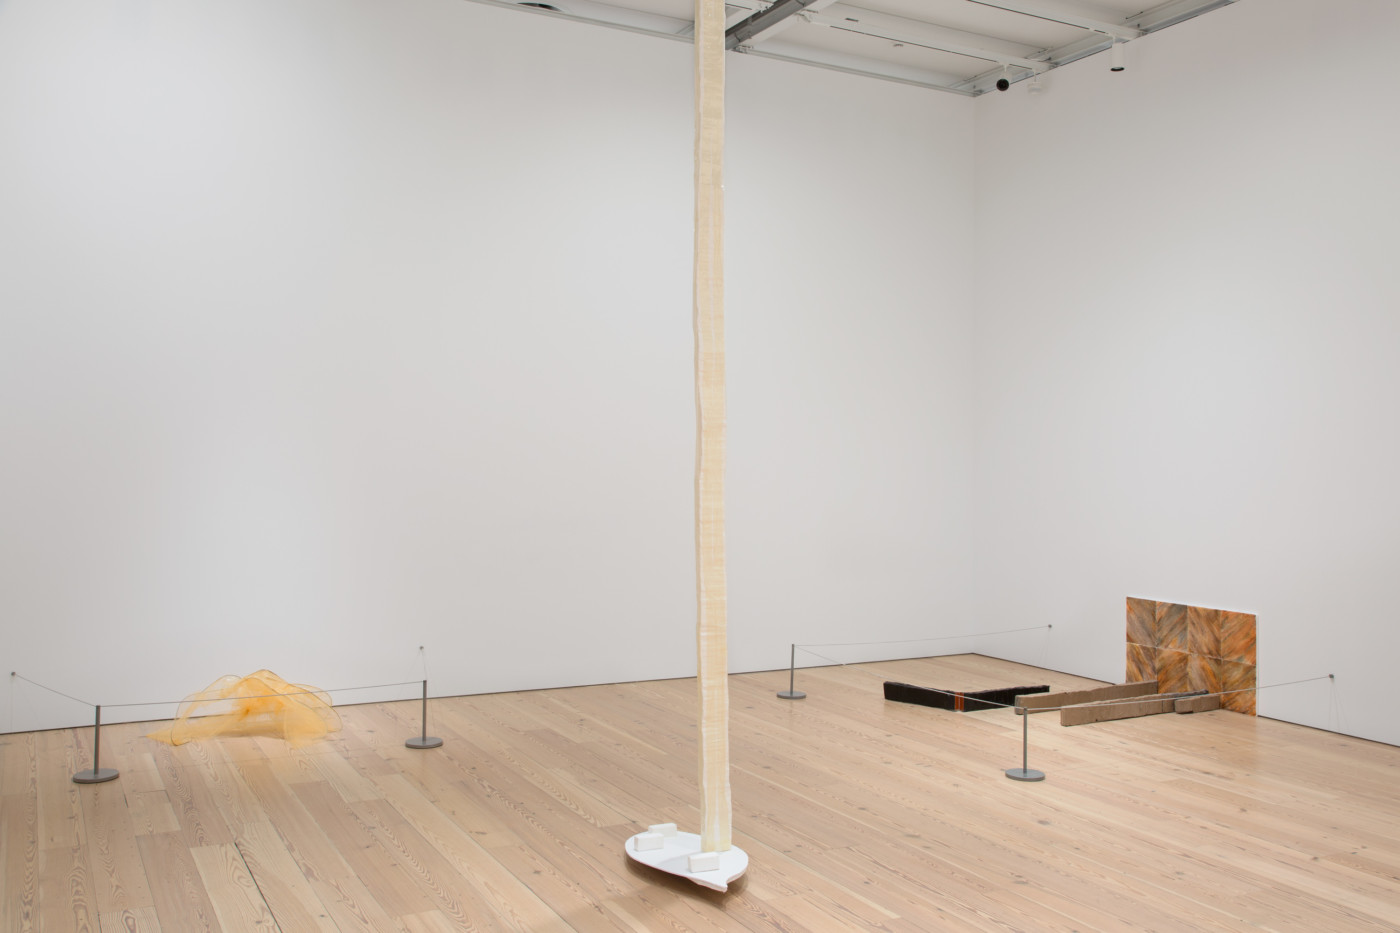 OLGA BALEMA  Whitney Biennial,  2019, Whitney Museum of American Art, New York, USA, installation view - High Art Gallery Paris